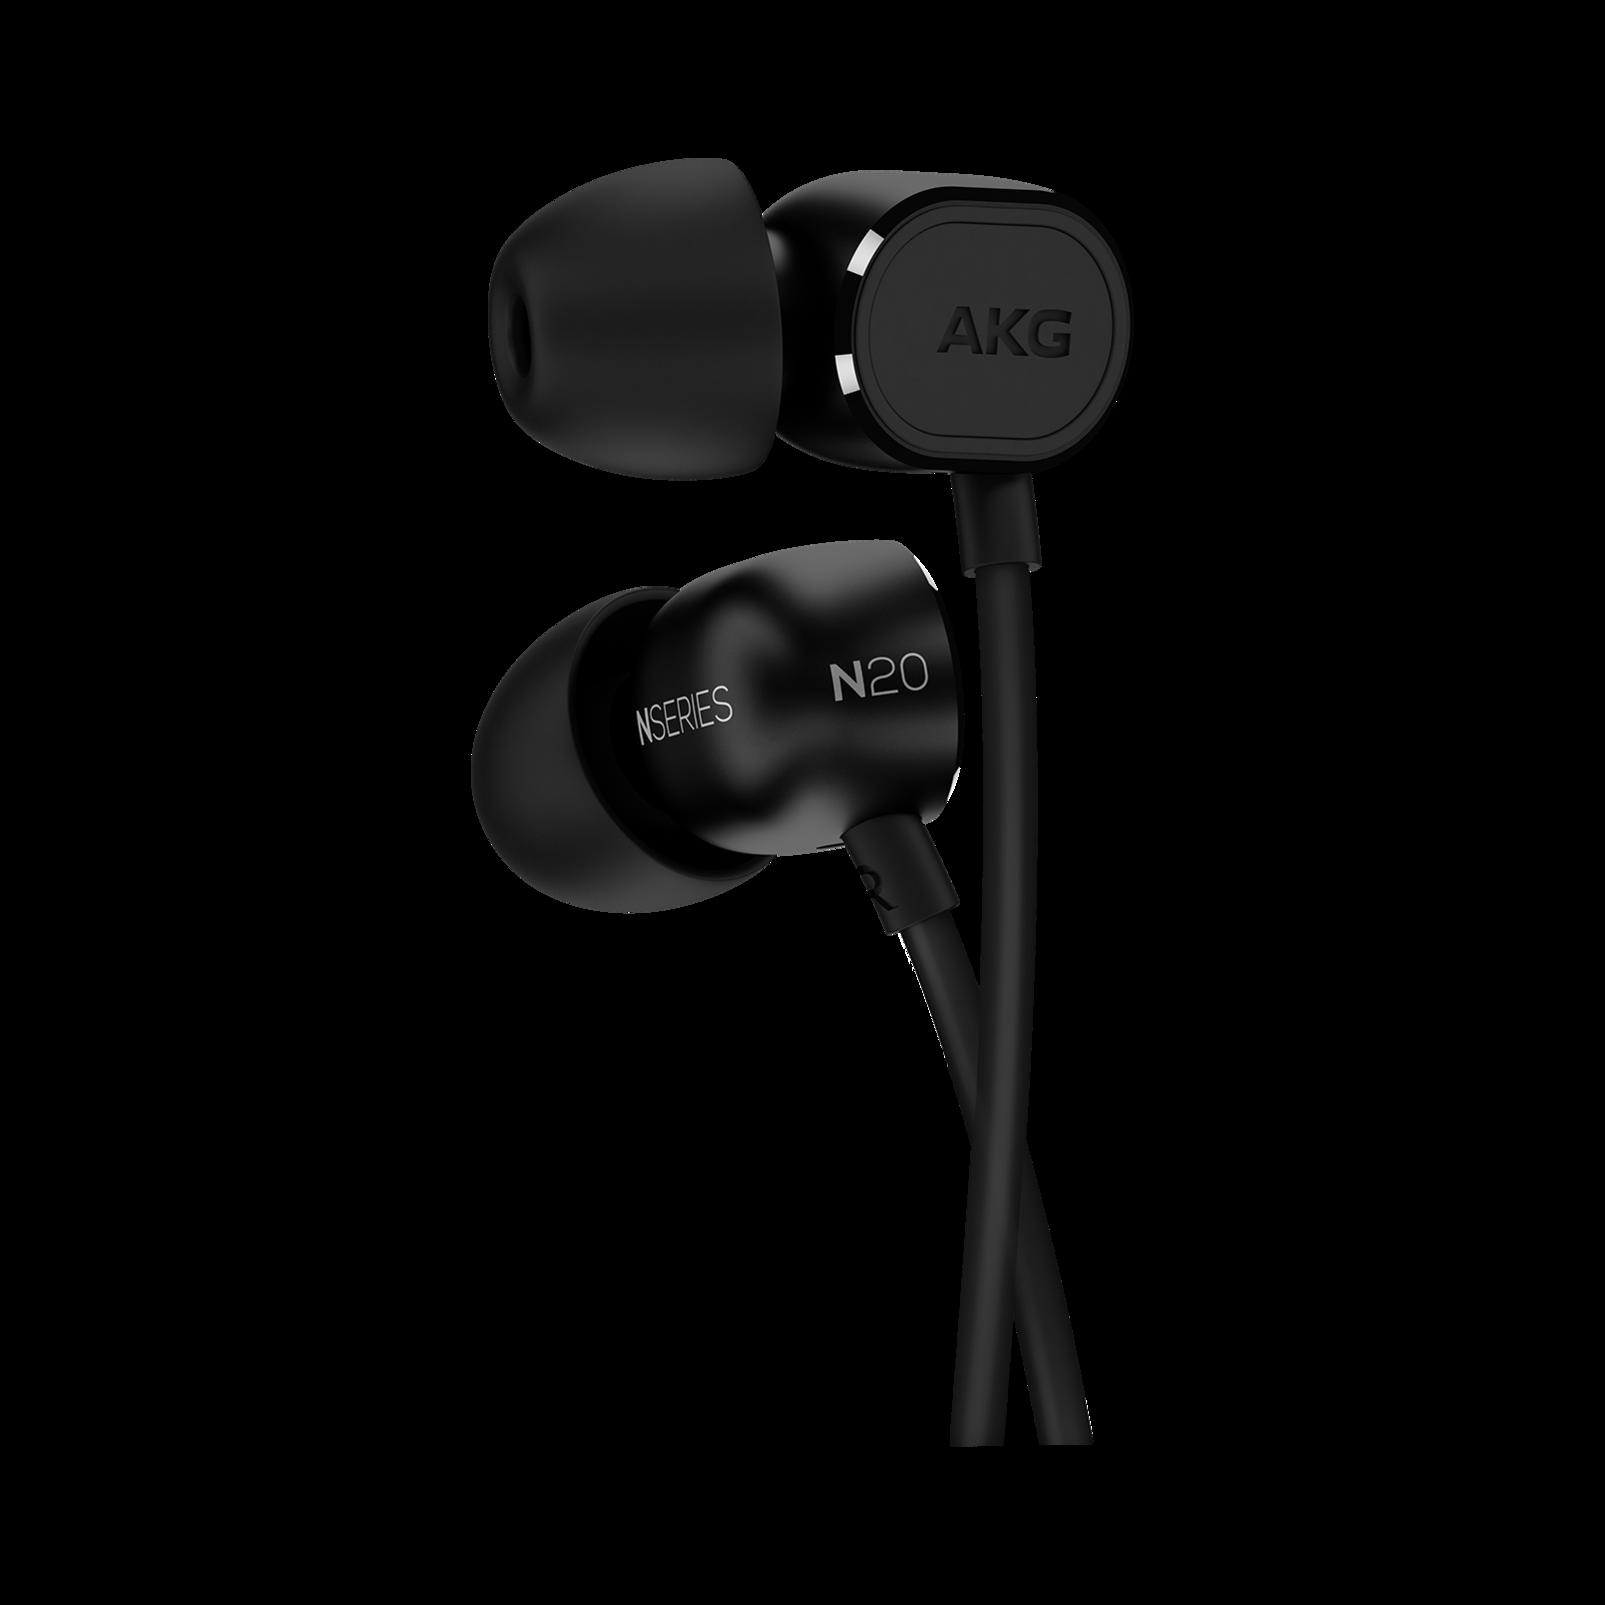 N20 - Black - Reference class in-ear headphones in aluminum enclousure - Hero